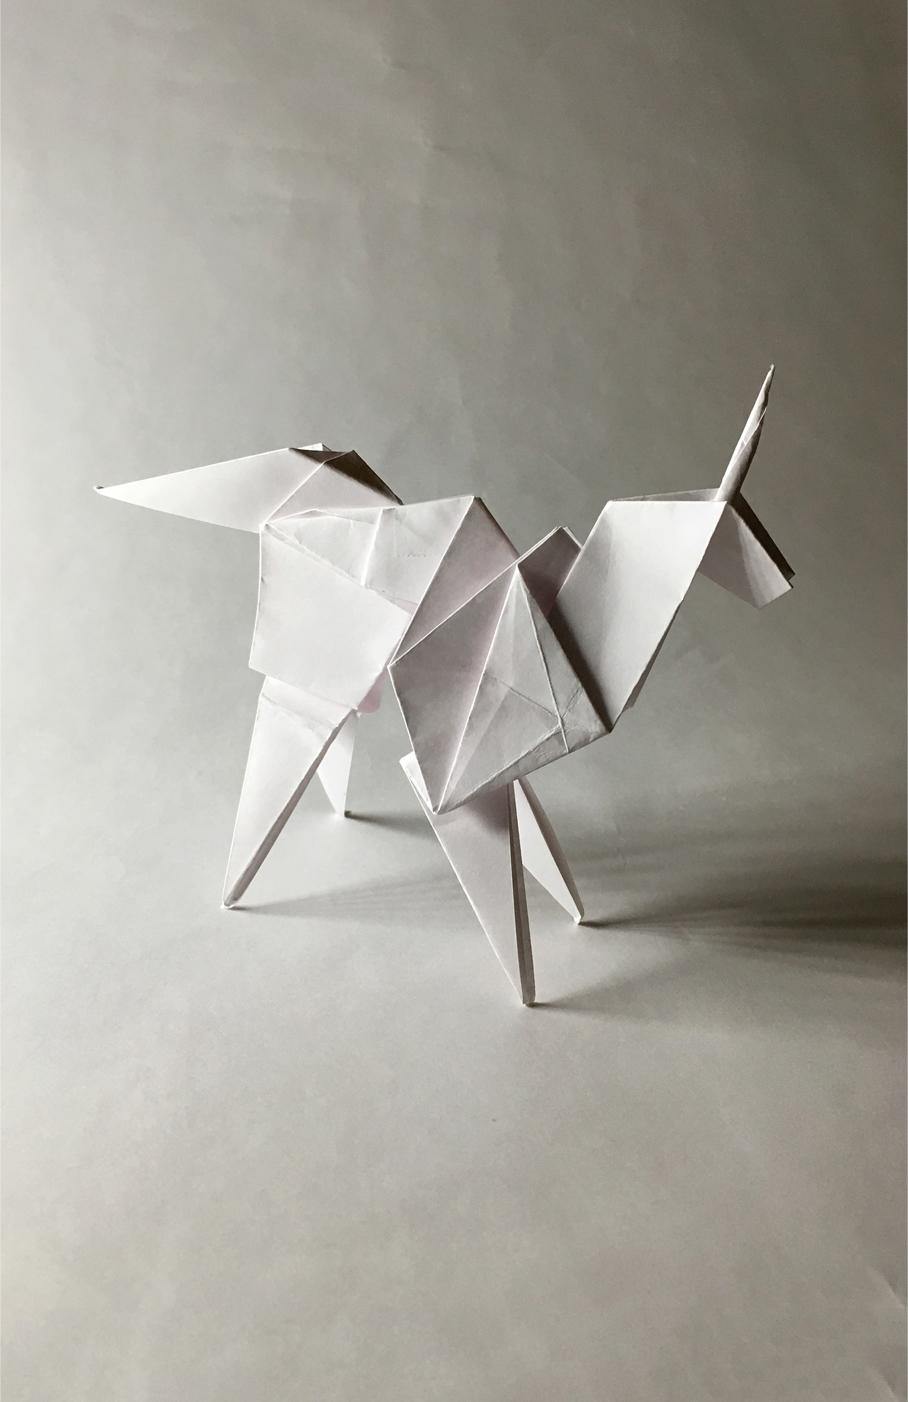 2016_12_8 - Origami Unicorn.jpg